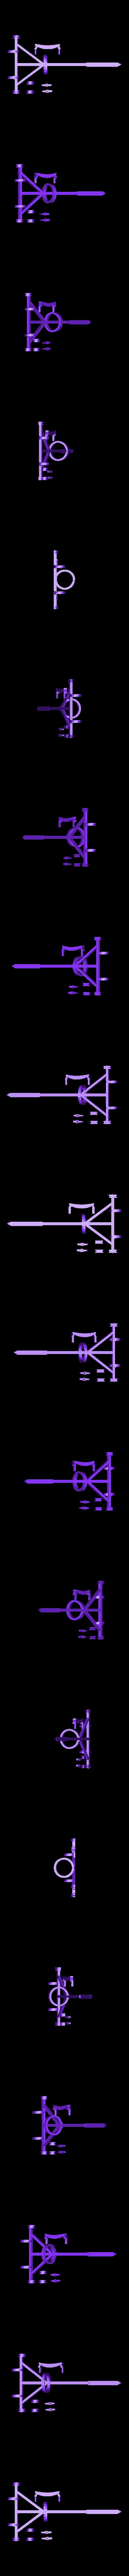 Glider_mainframe.stl Download free STL file Leonardo Da Vinci - Ornithoper • Design to 3D print, Slagerqod